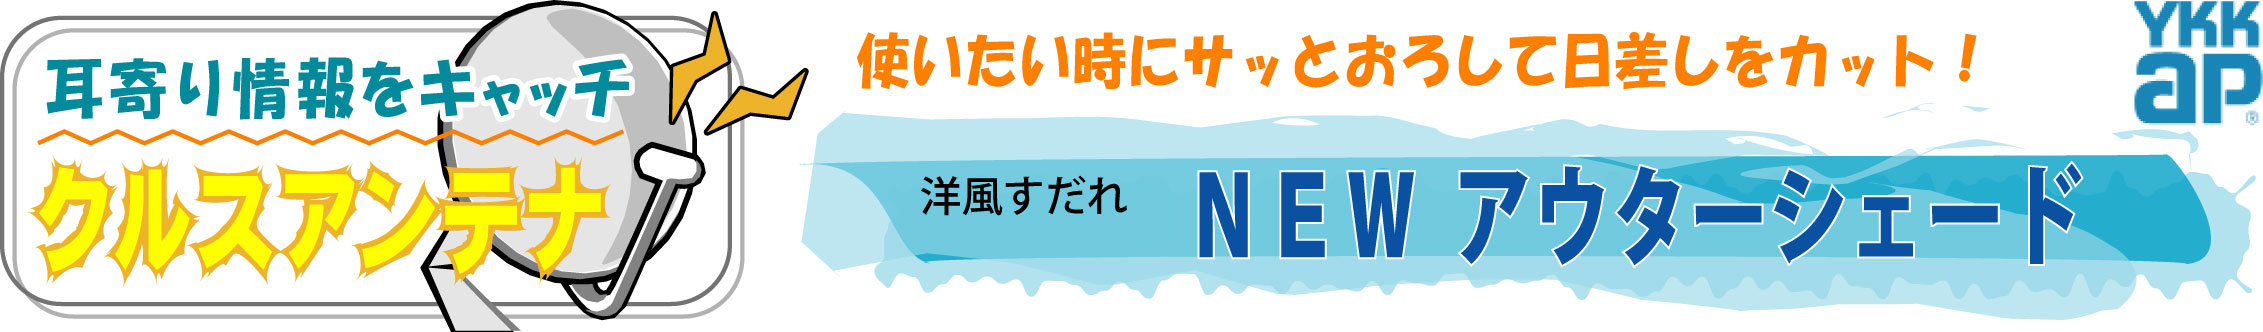 KuraSi-natu-sin62-16.jpg